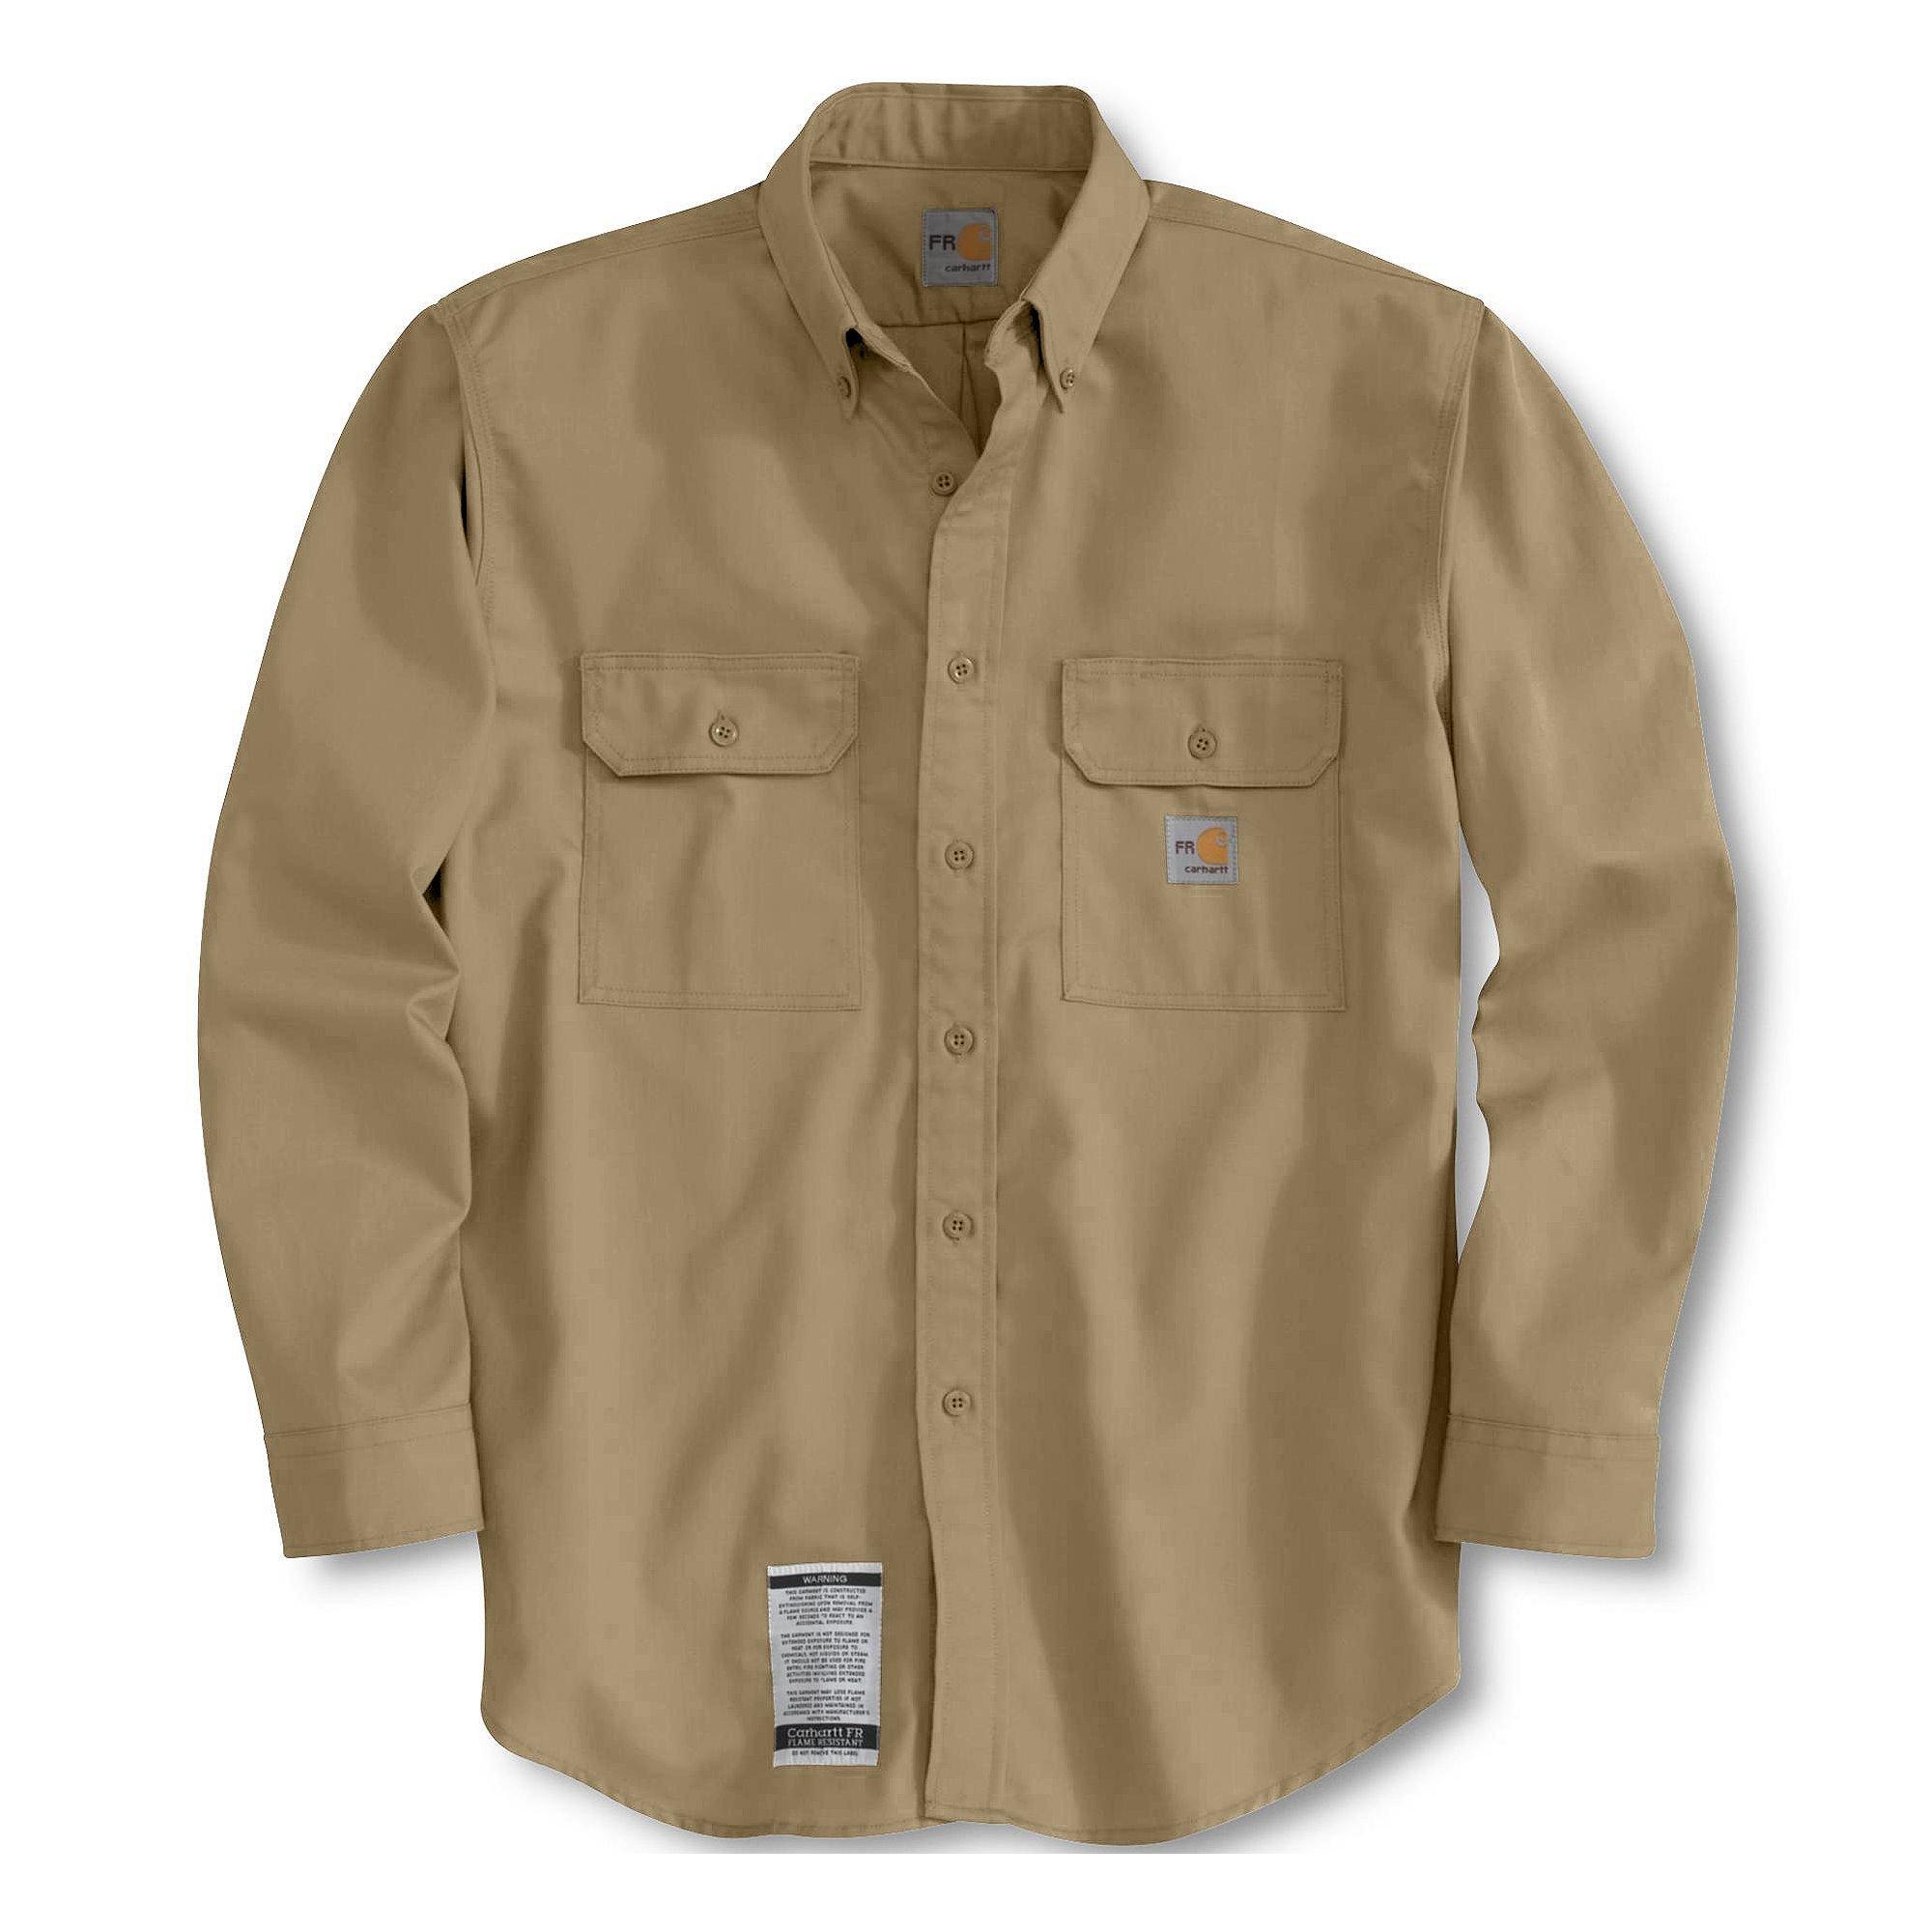 Carhartt Flame-resistant Twill Shirt, KHAKI, MED.TALL